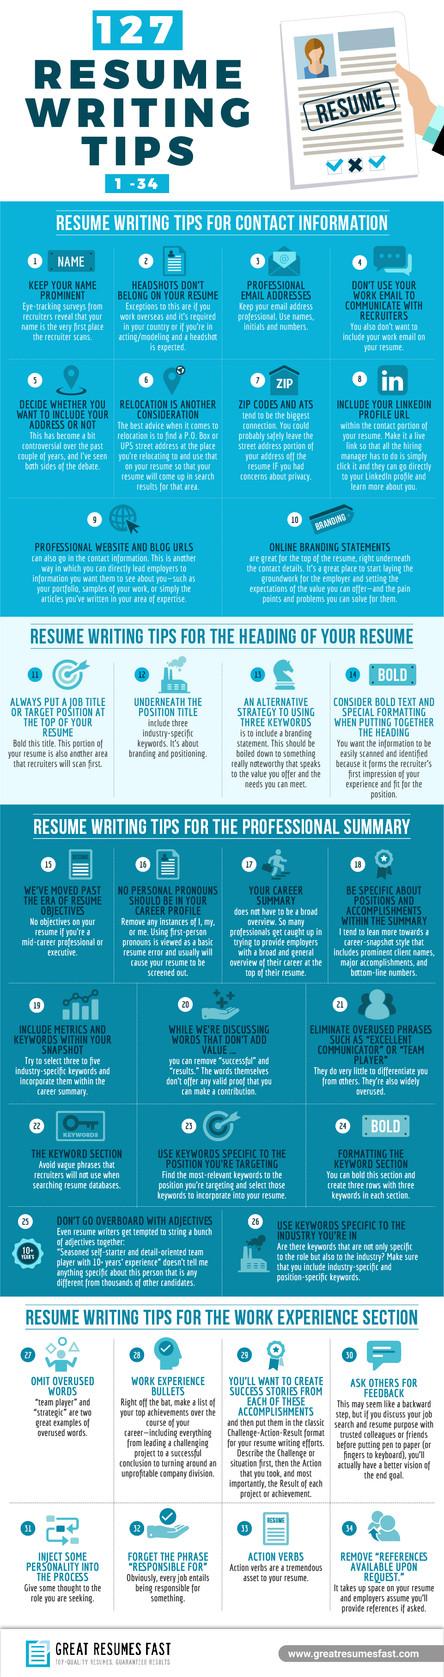 127 Resume Writing Tips